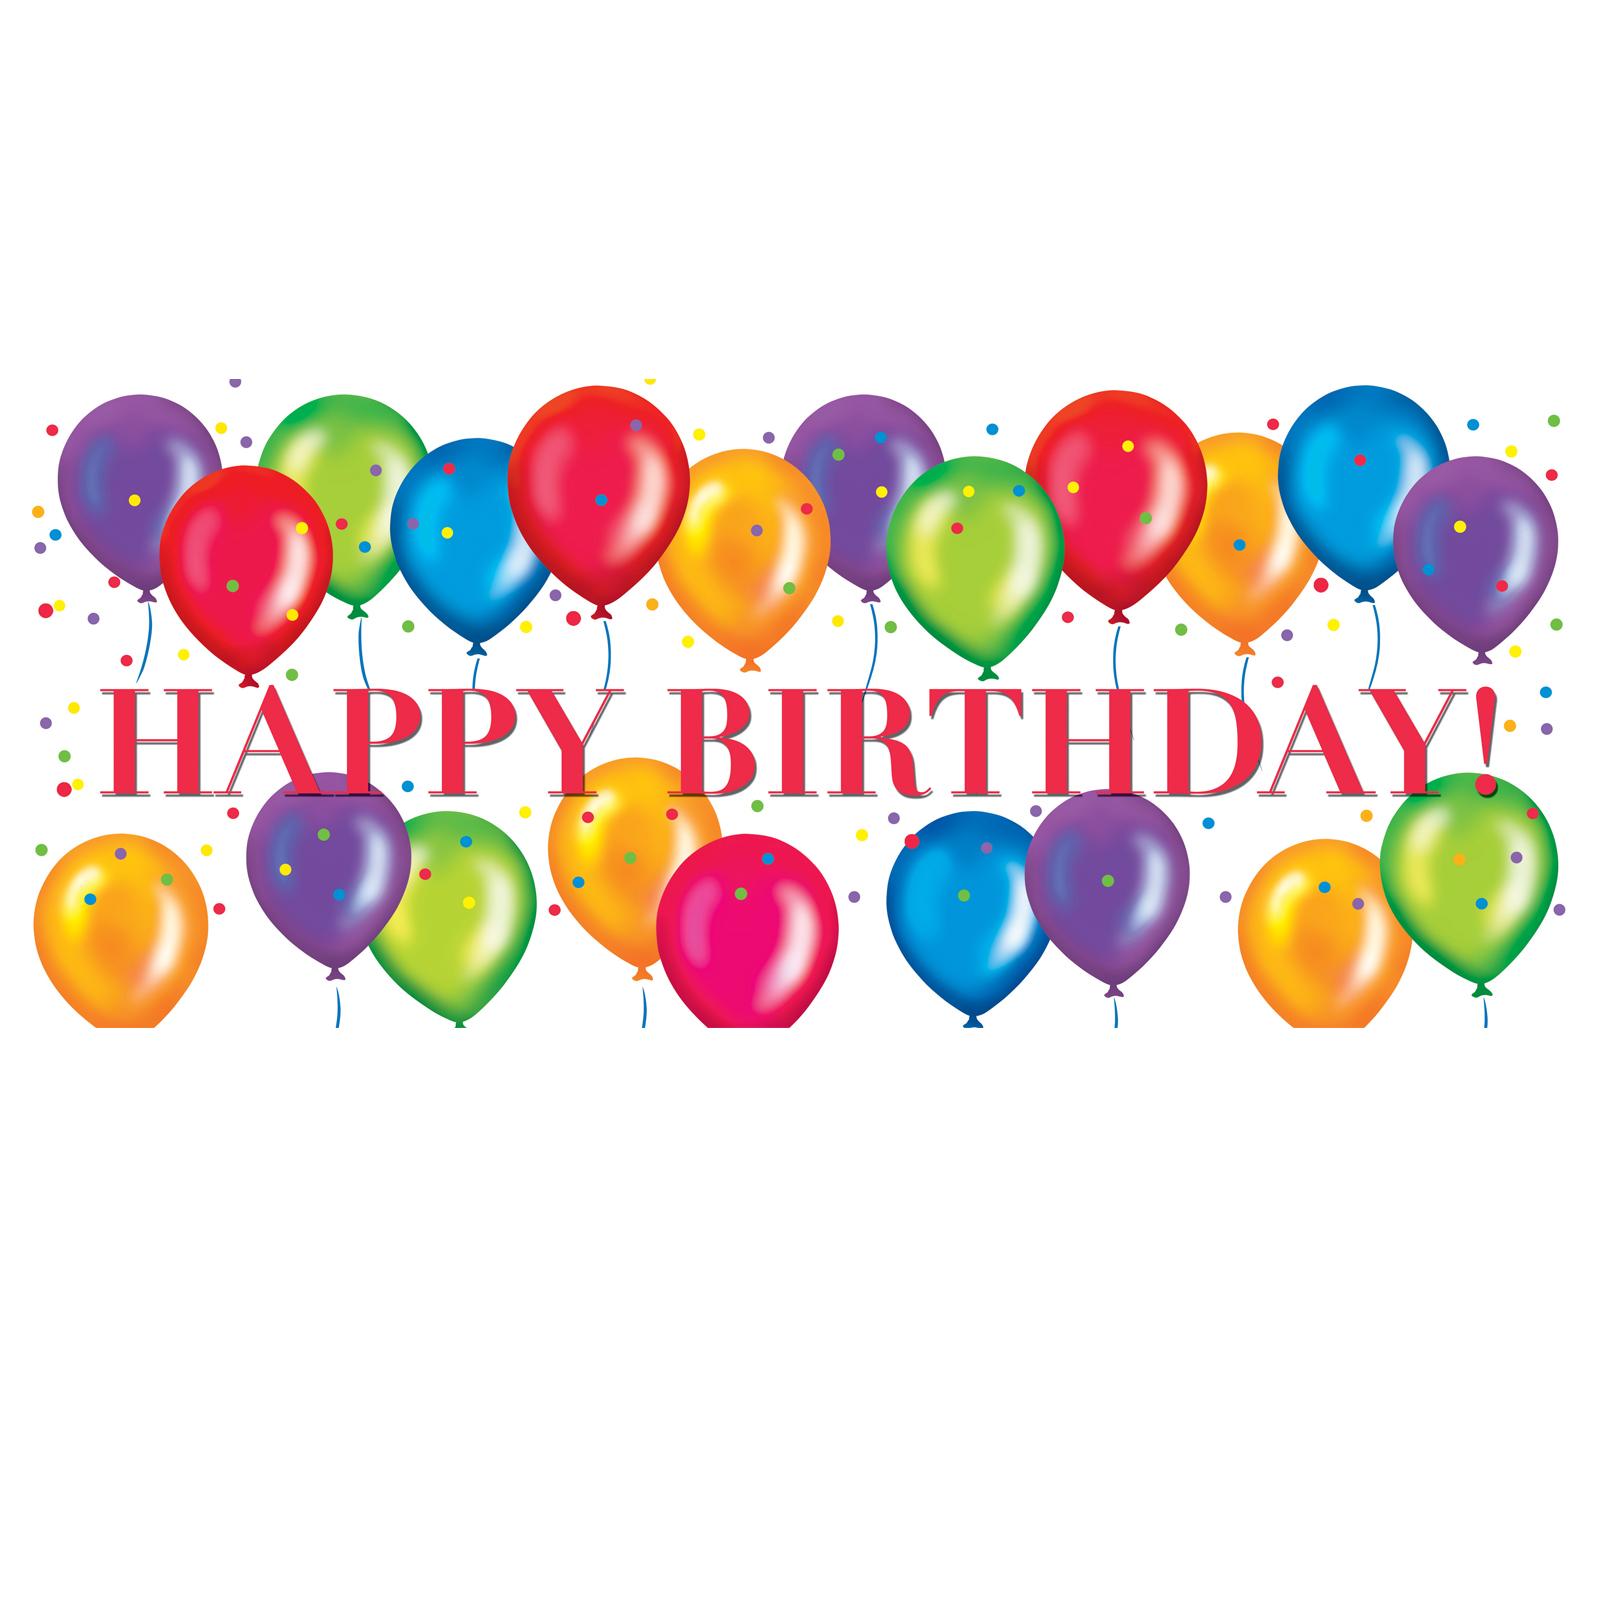 Happy Birthday Animated Clipart - Clipart Kid